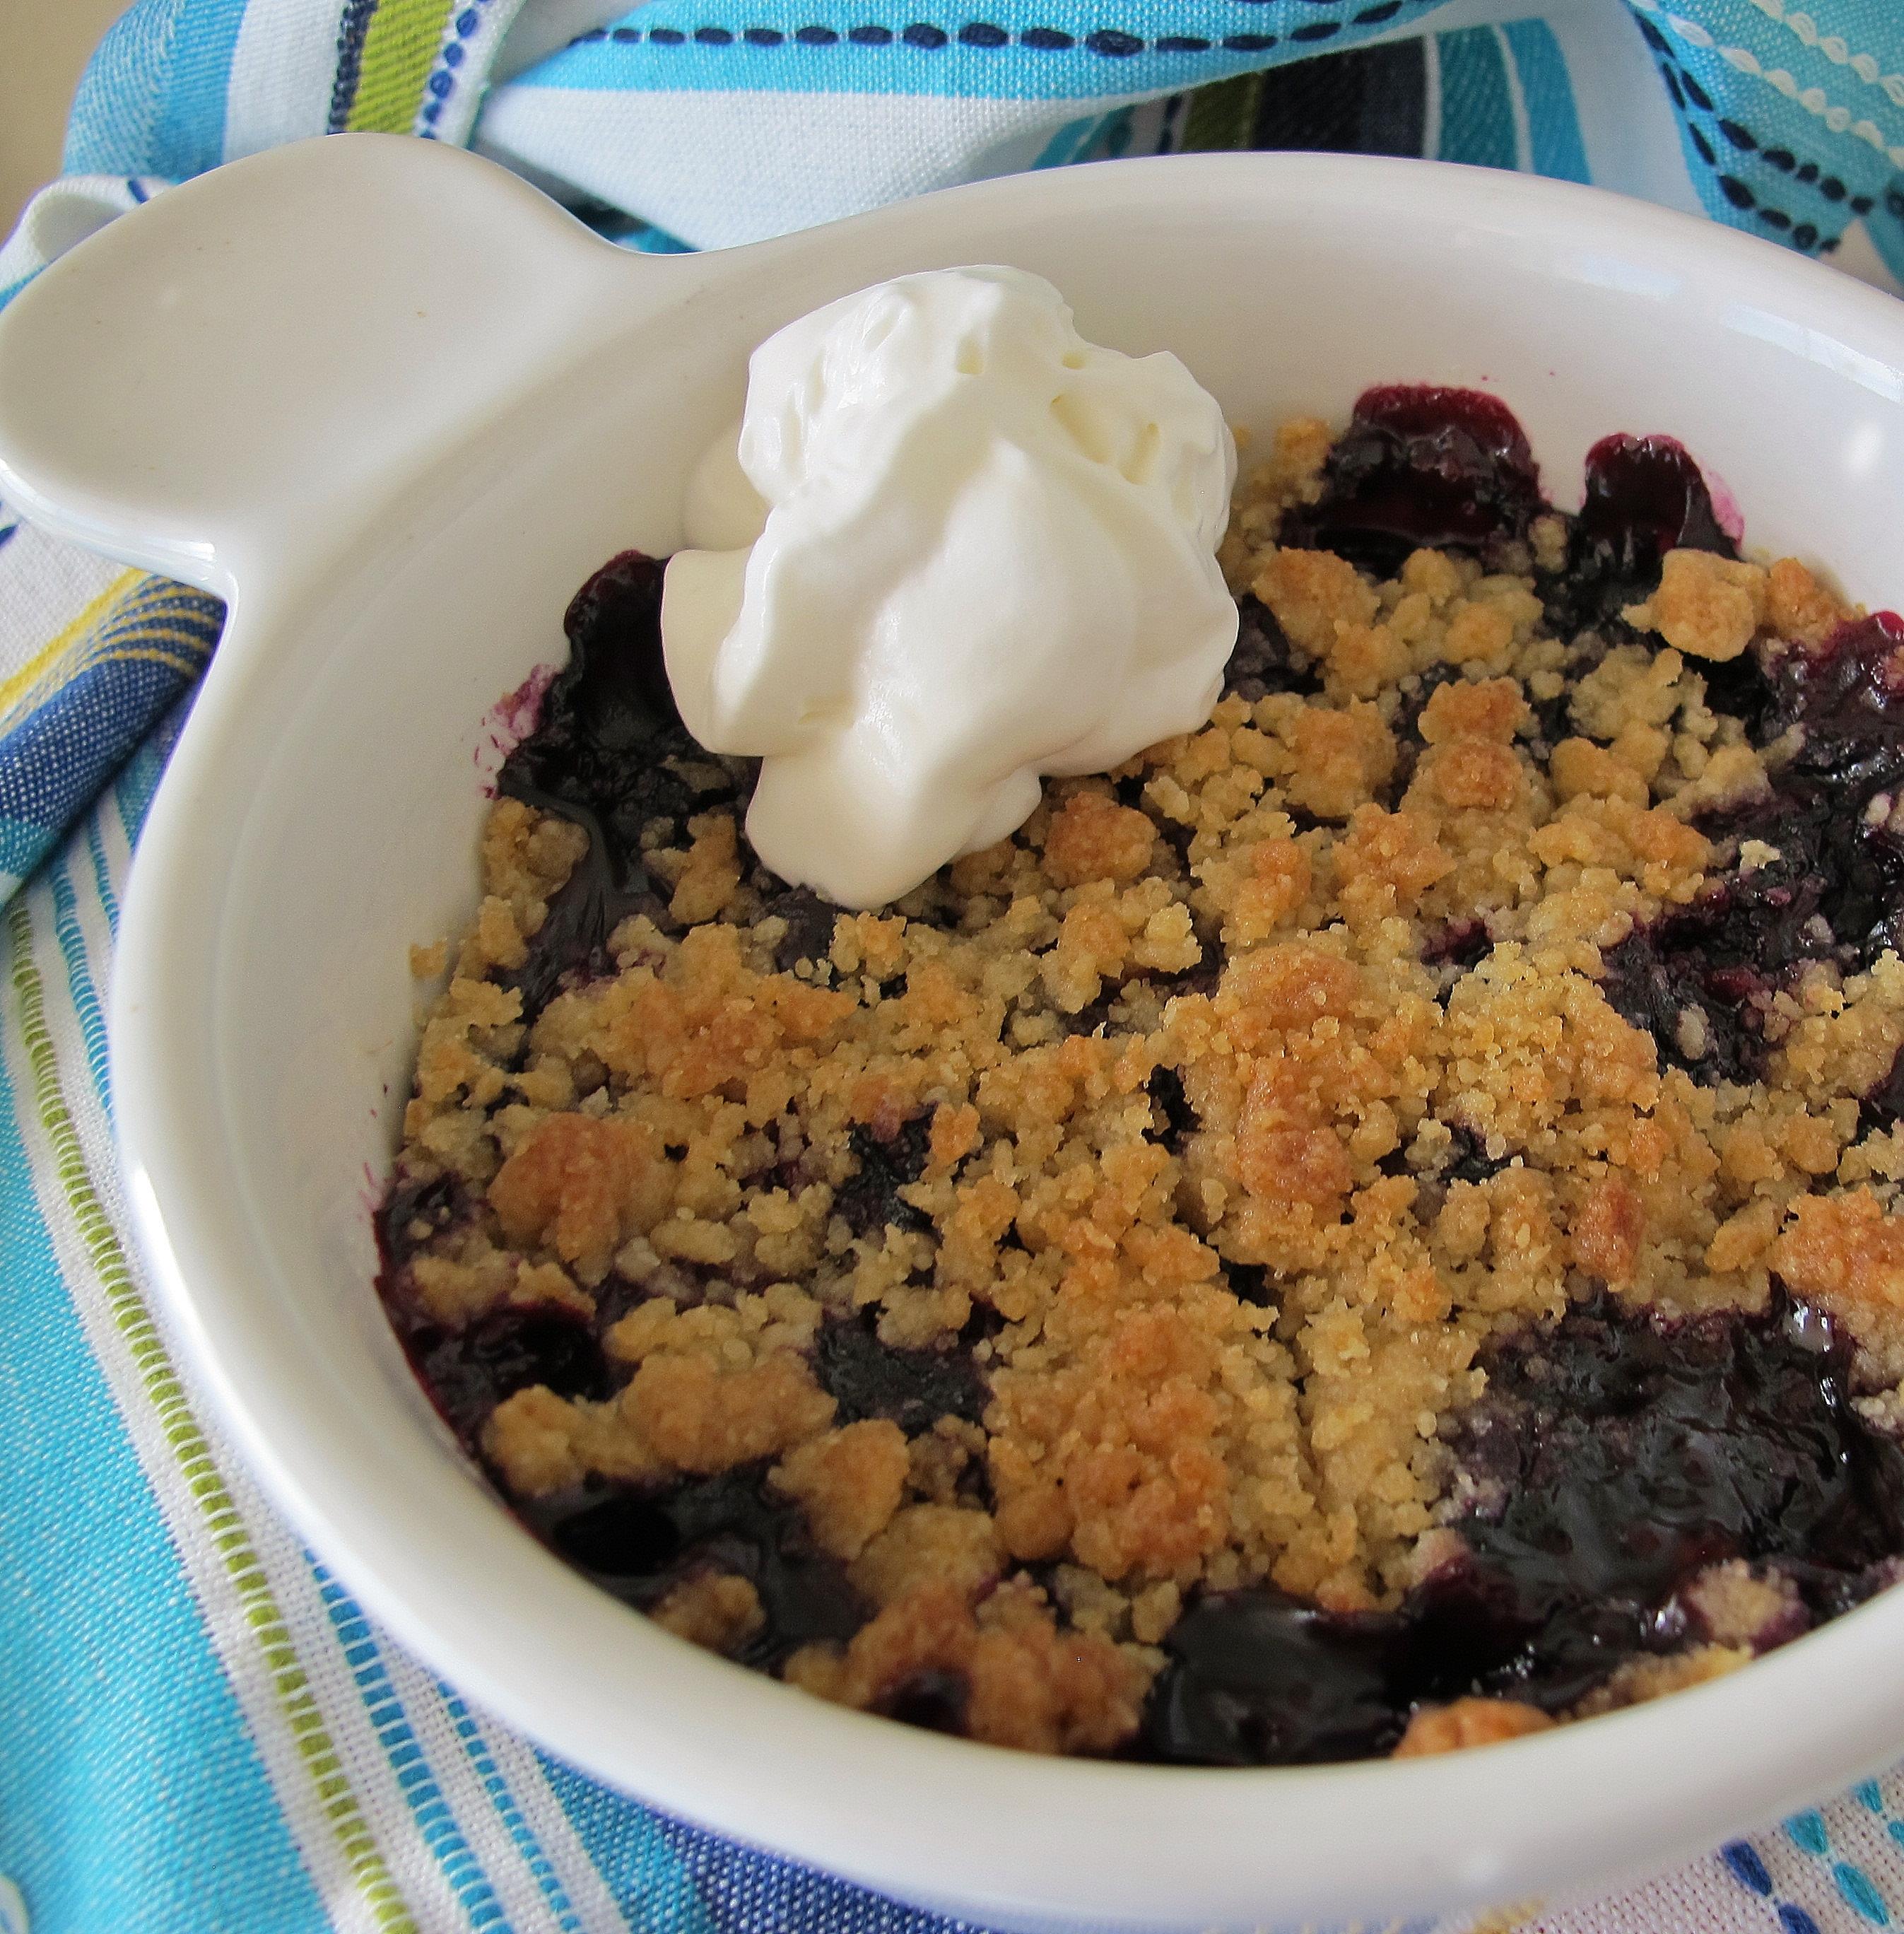 Classic American Blueberry Crisp naples34102